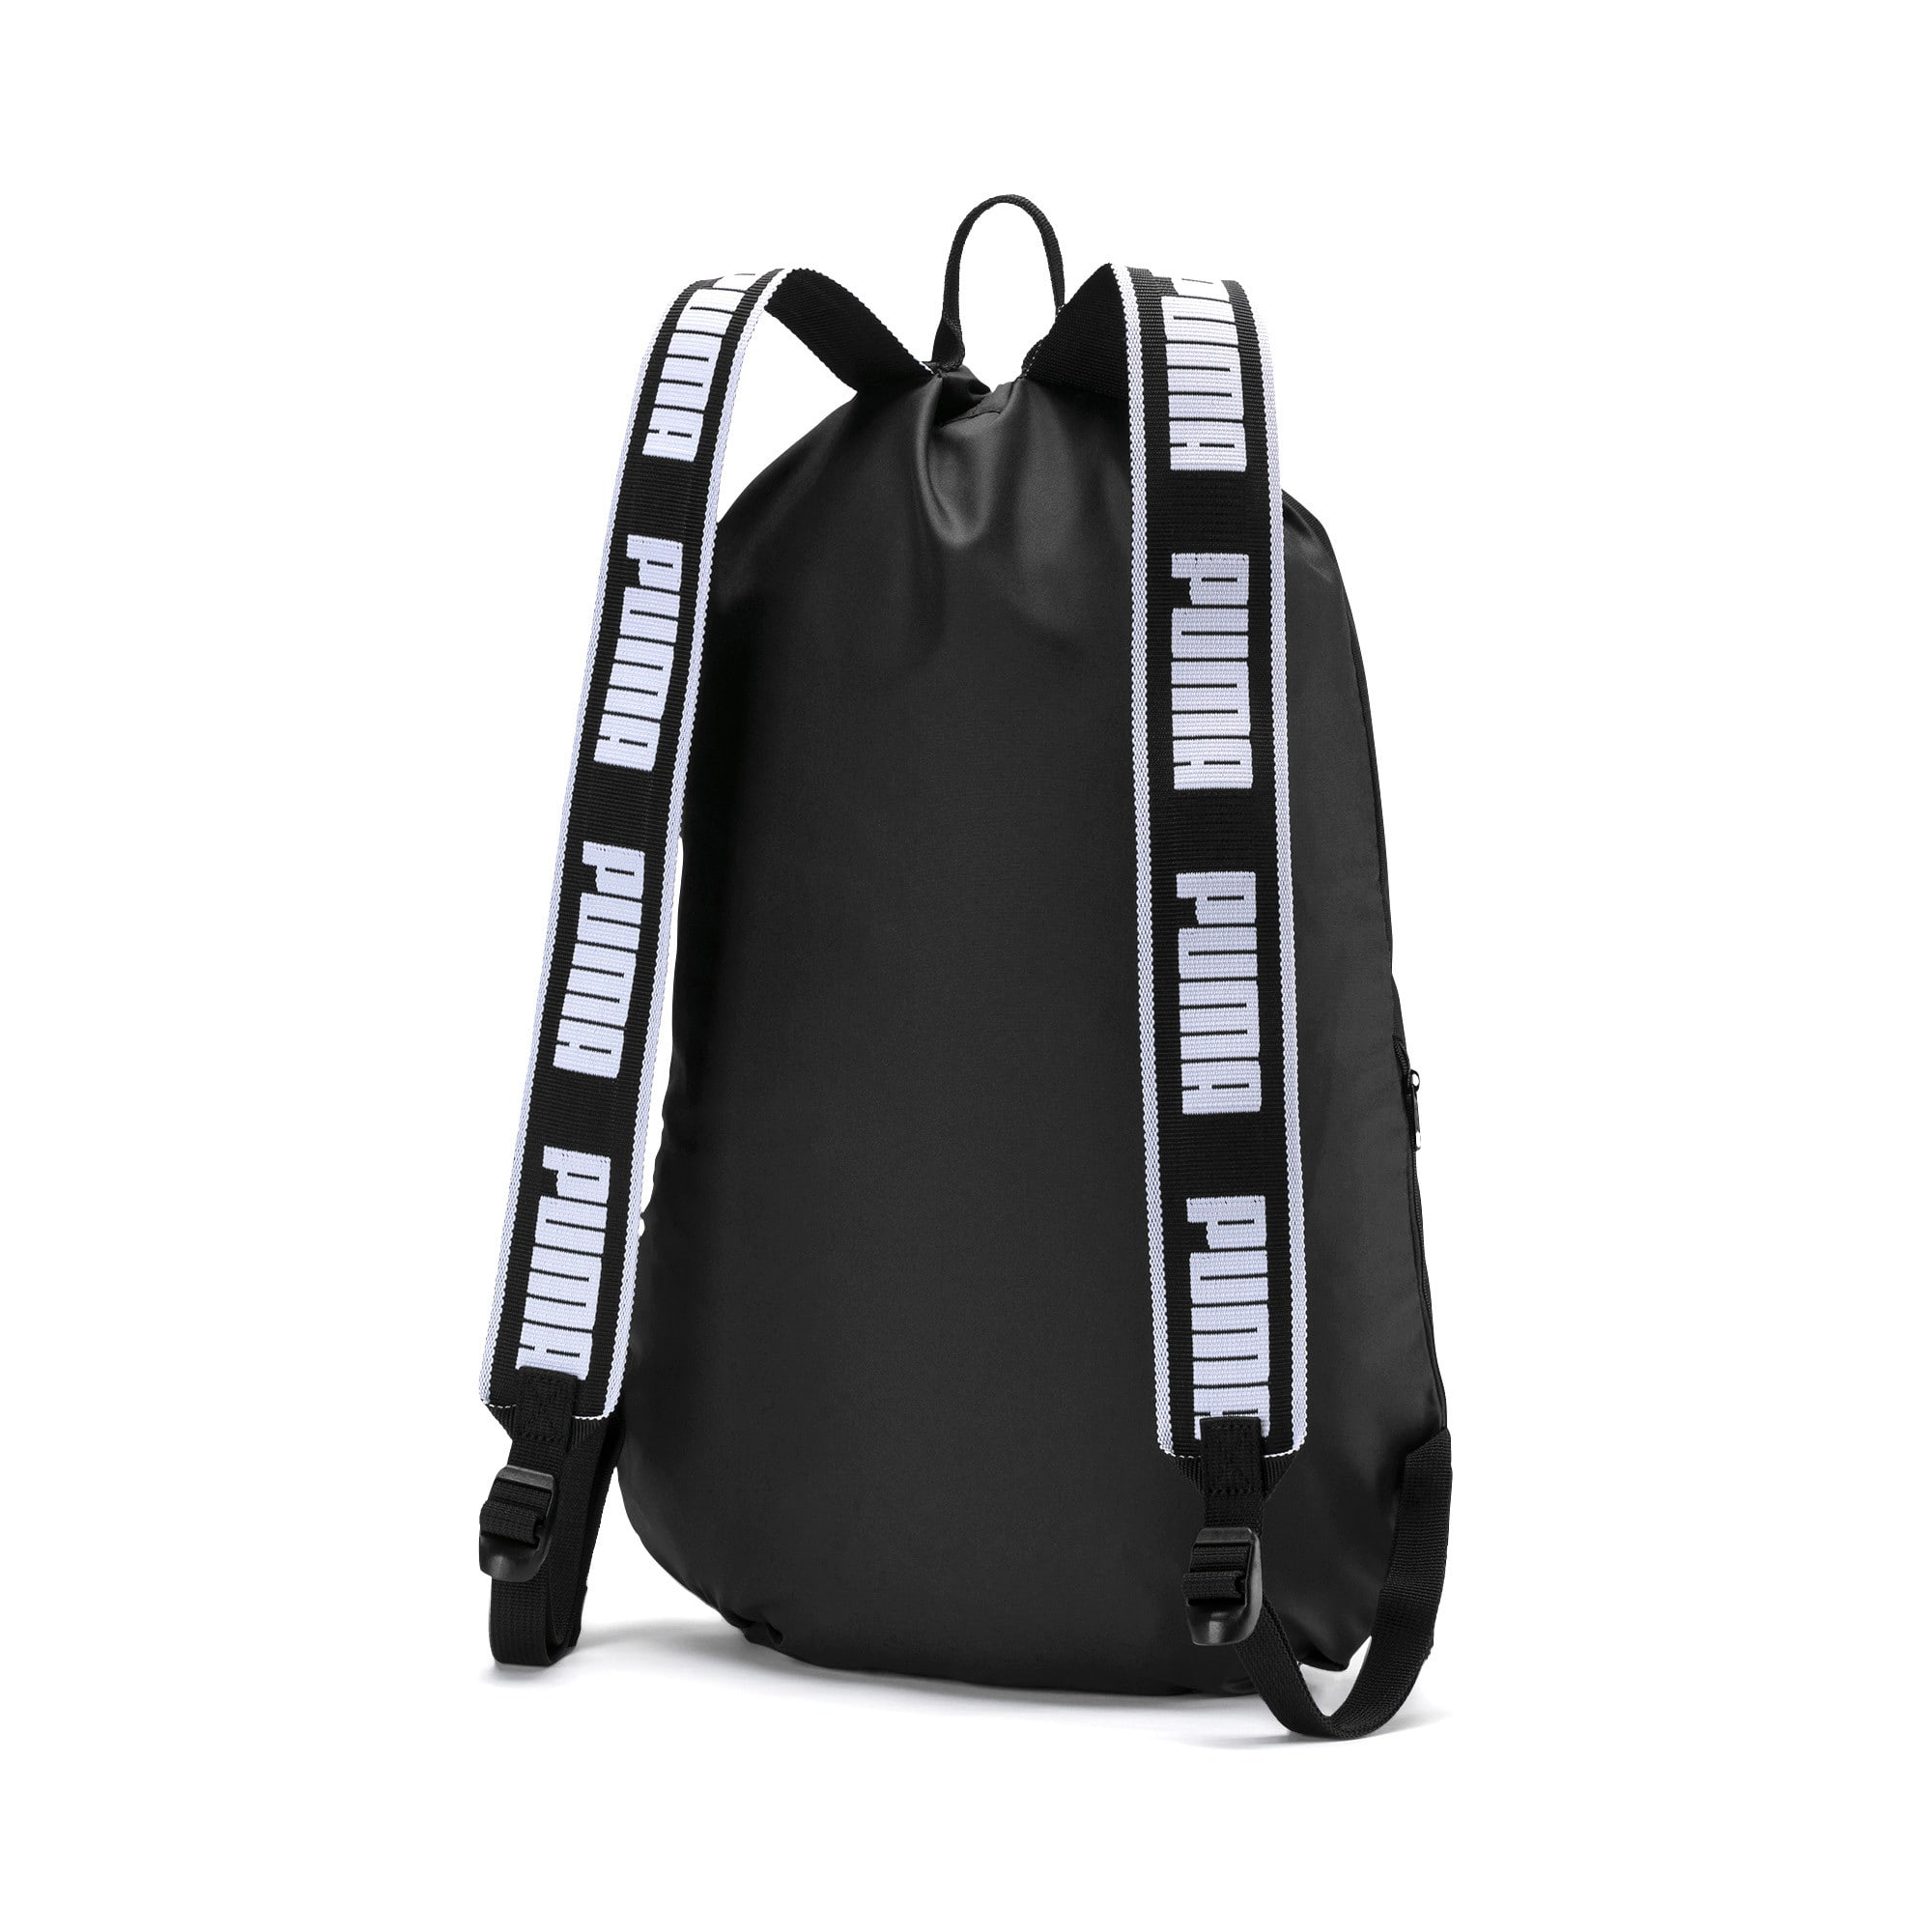 Thumbnail 2 of Sole Smart Bag, Puma Black, medium-IND